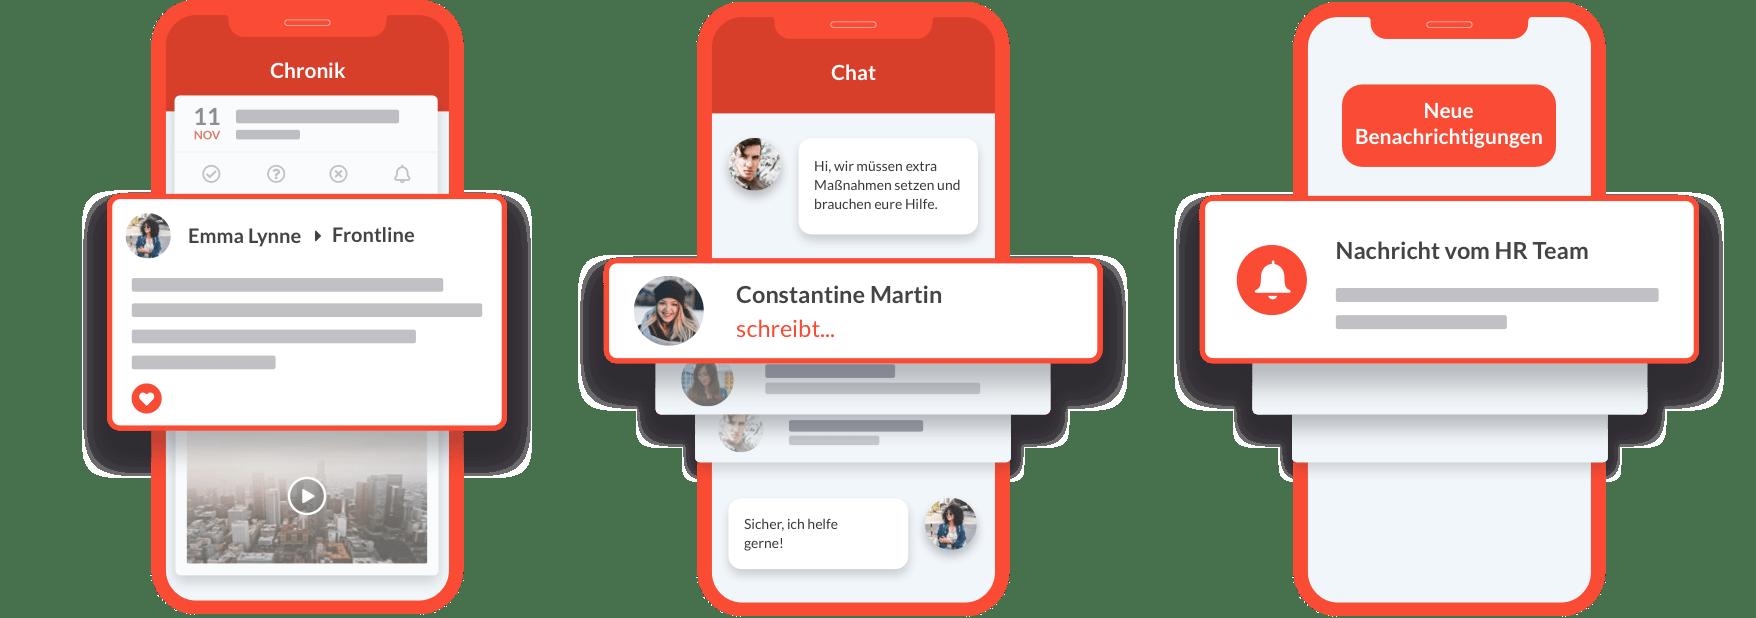 App-screens-DE